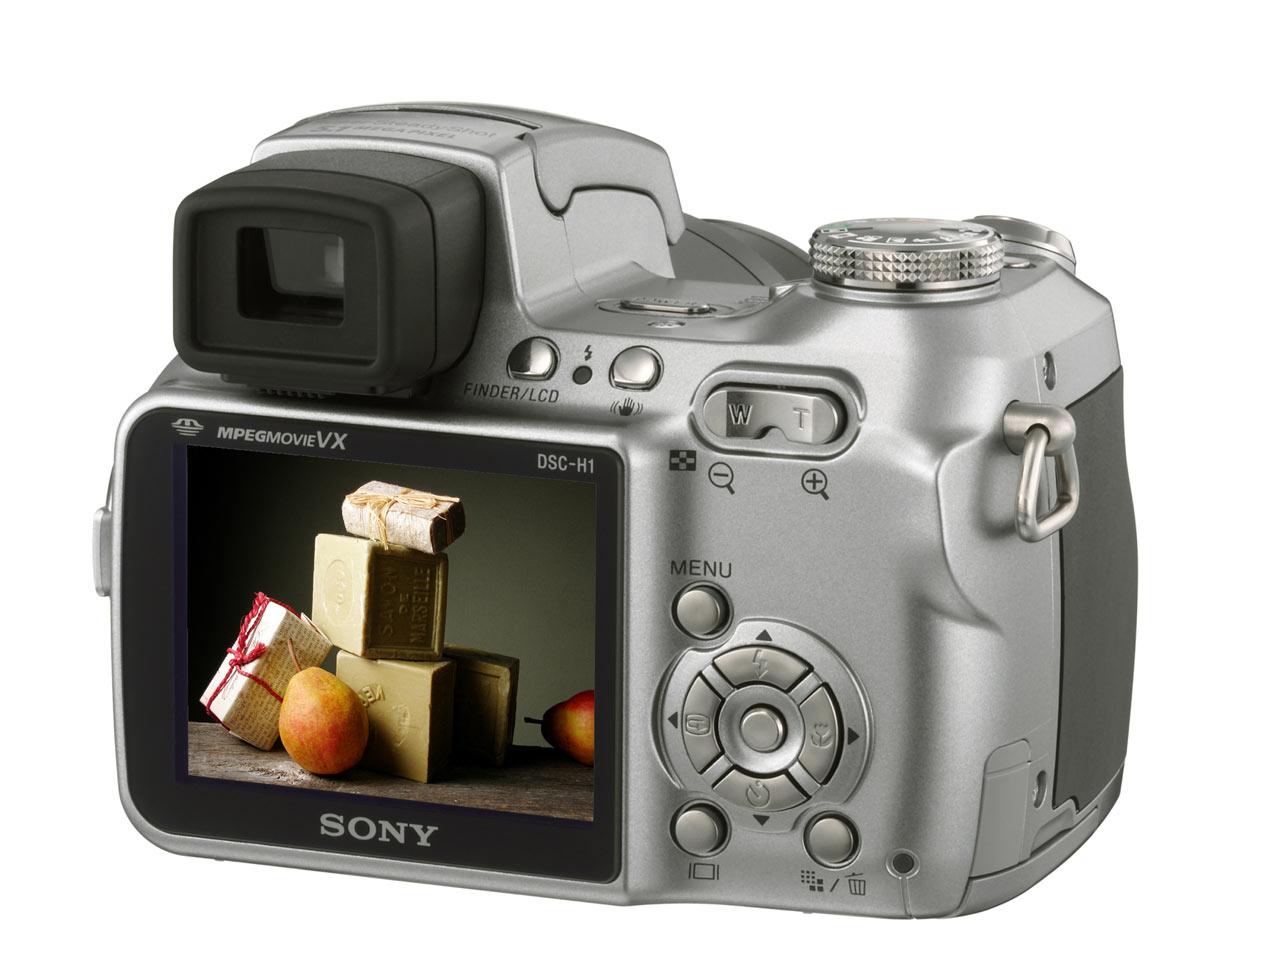 Sony Cyber Shot Dsc H1 Digital Photography Review